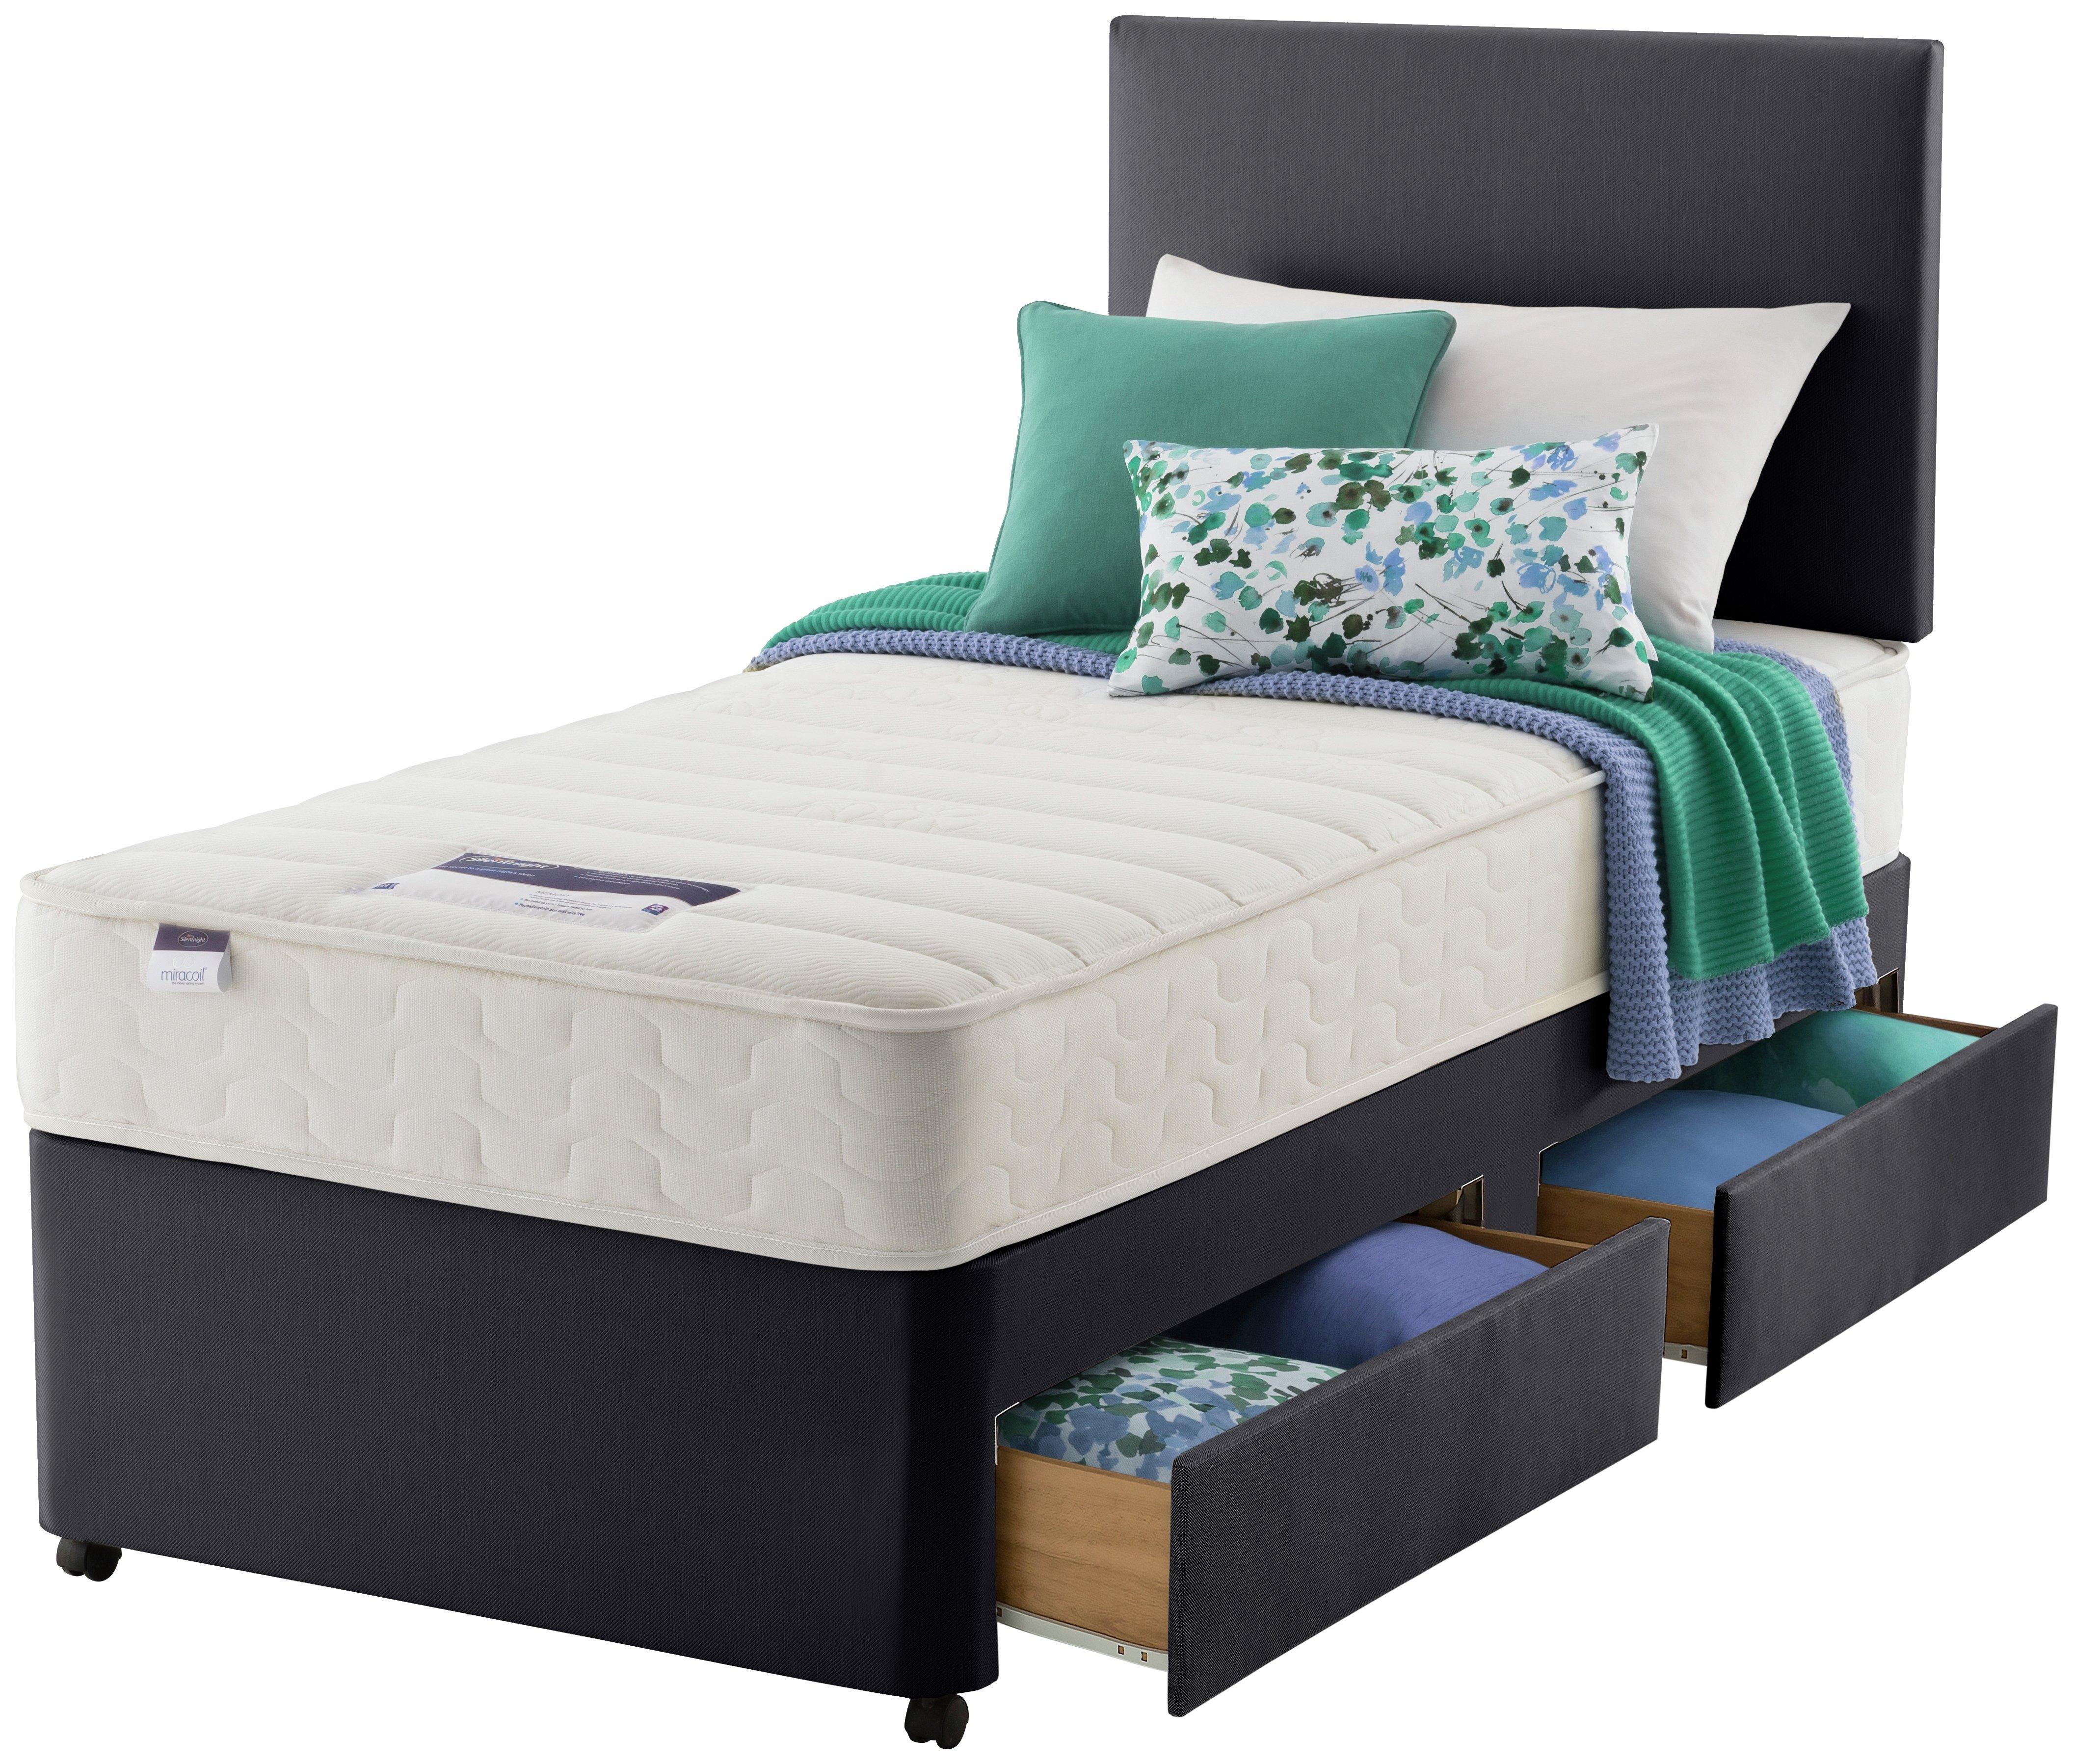 Silentnight northolt memory single 2 drw divan bed for Cheap 4 drawer divan beds